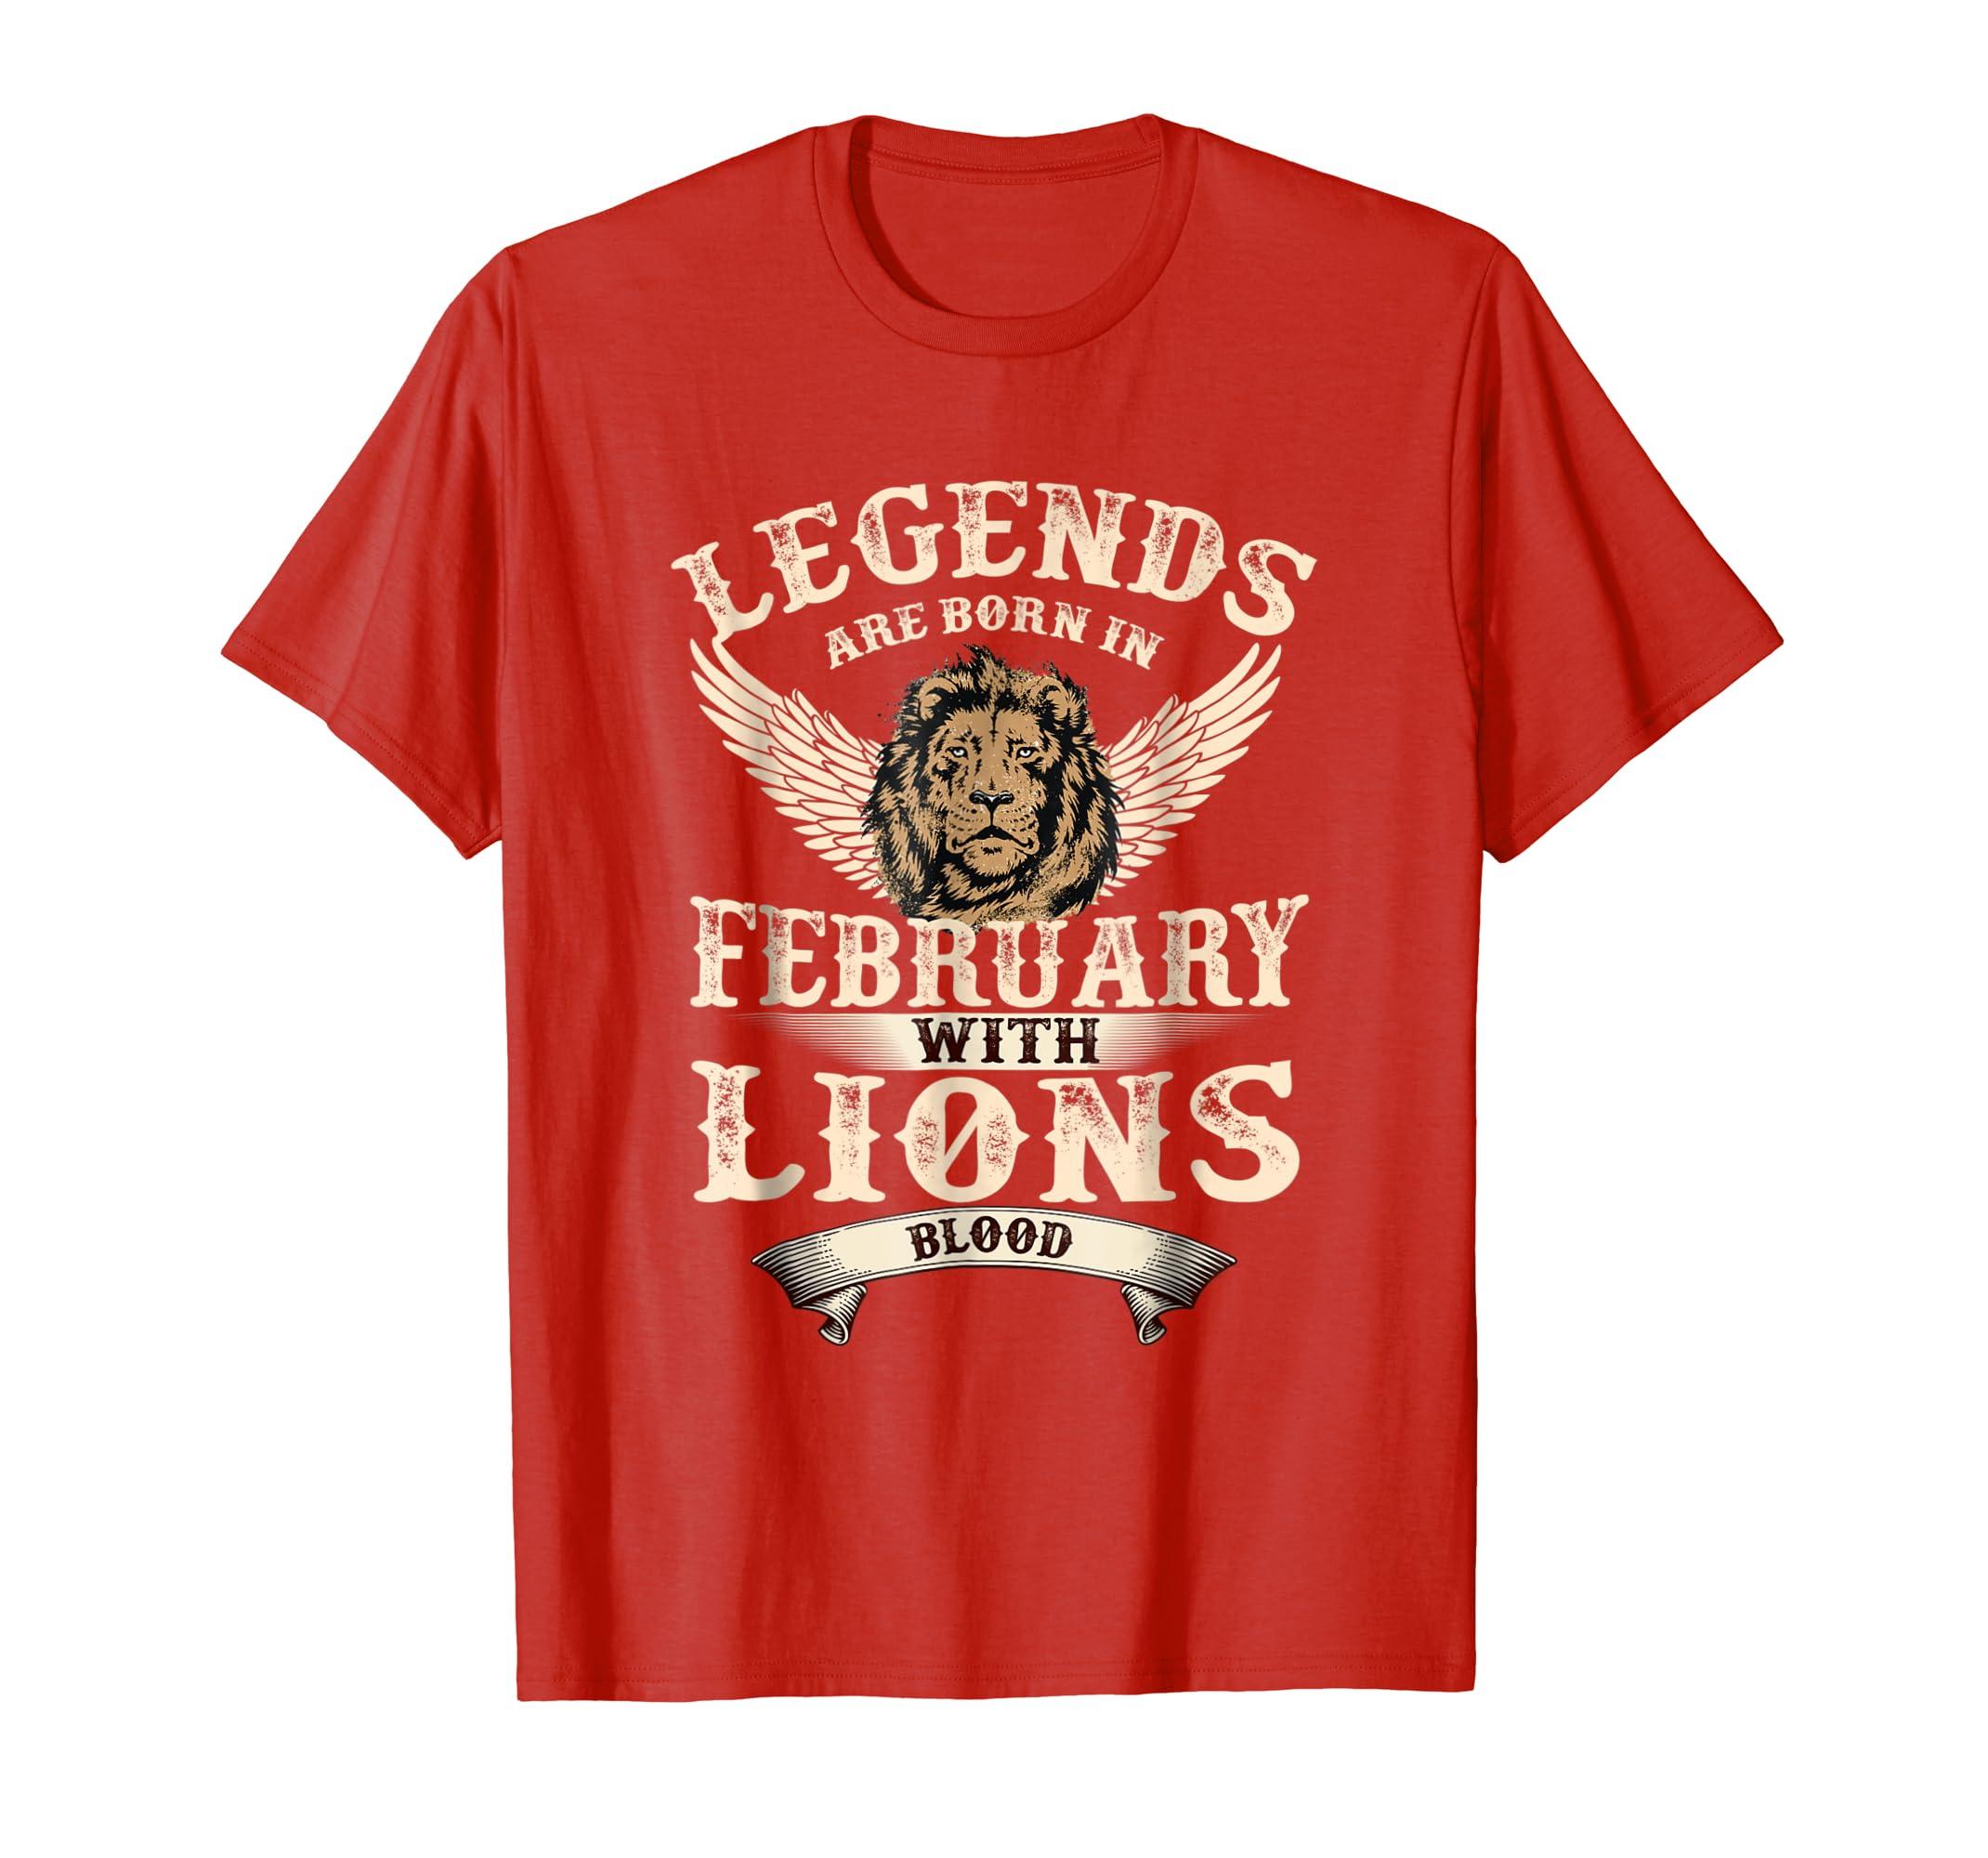 Legends are born in february